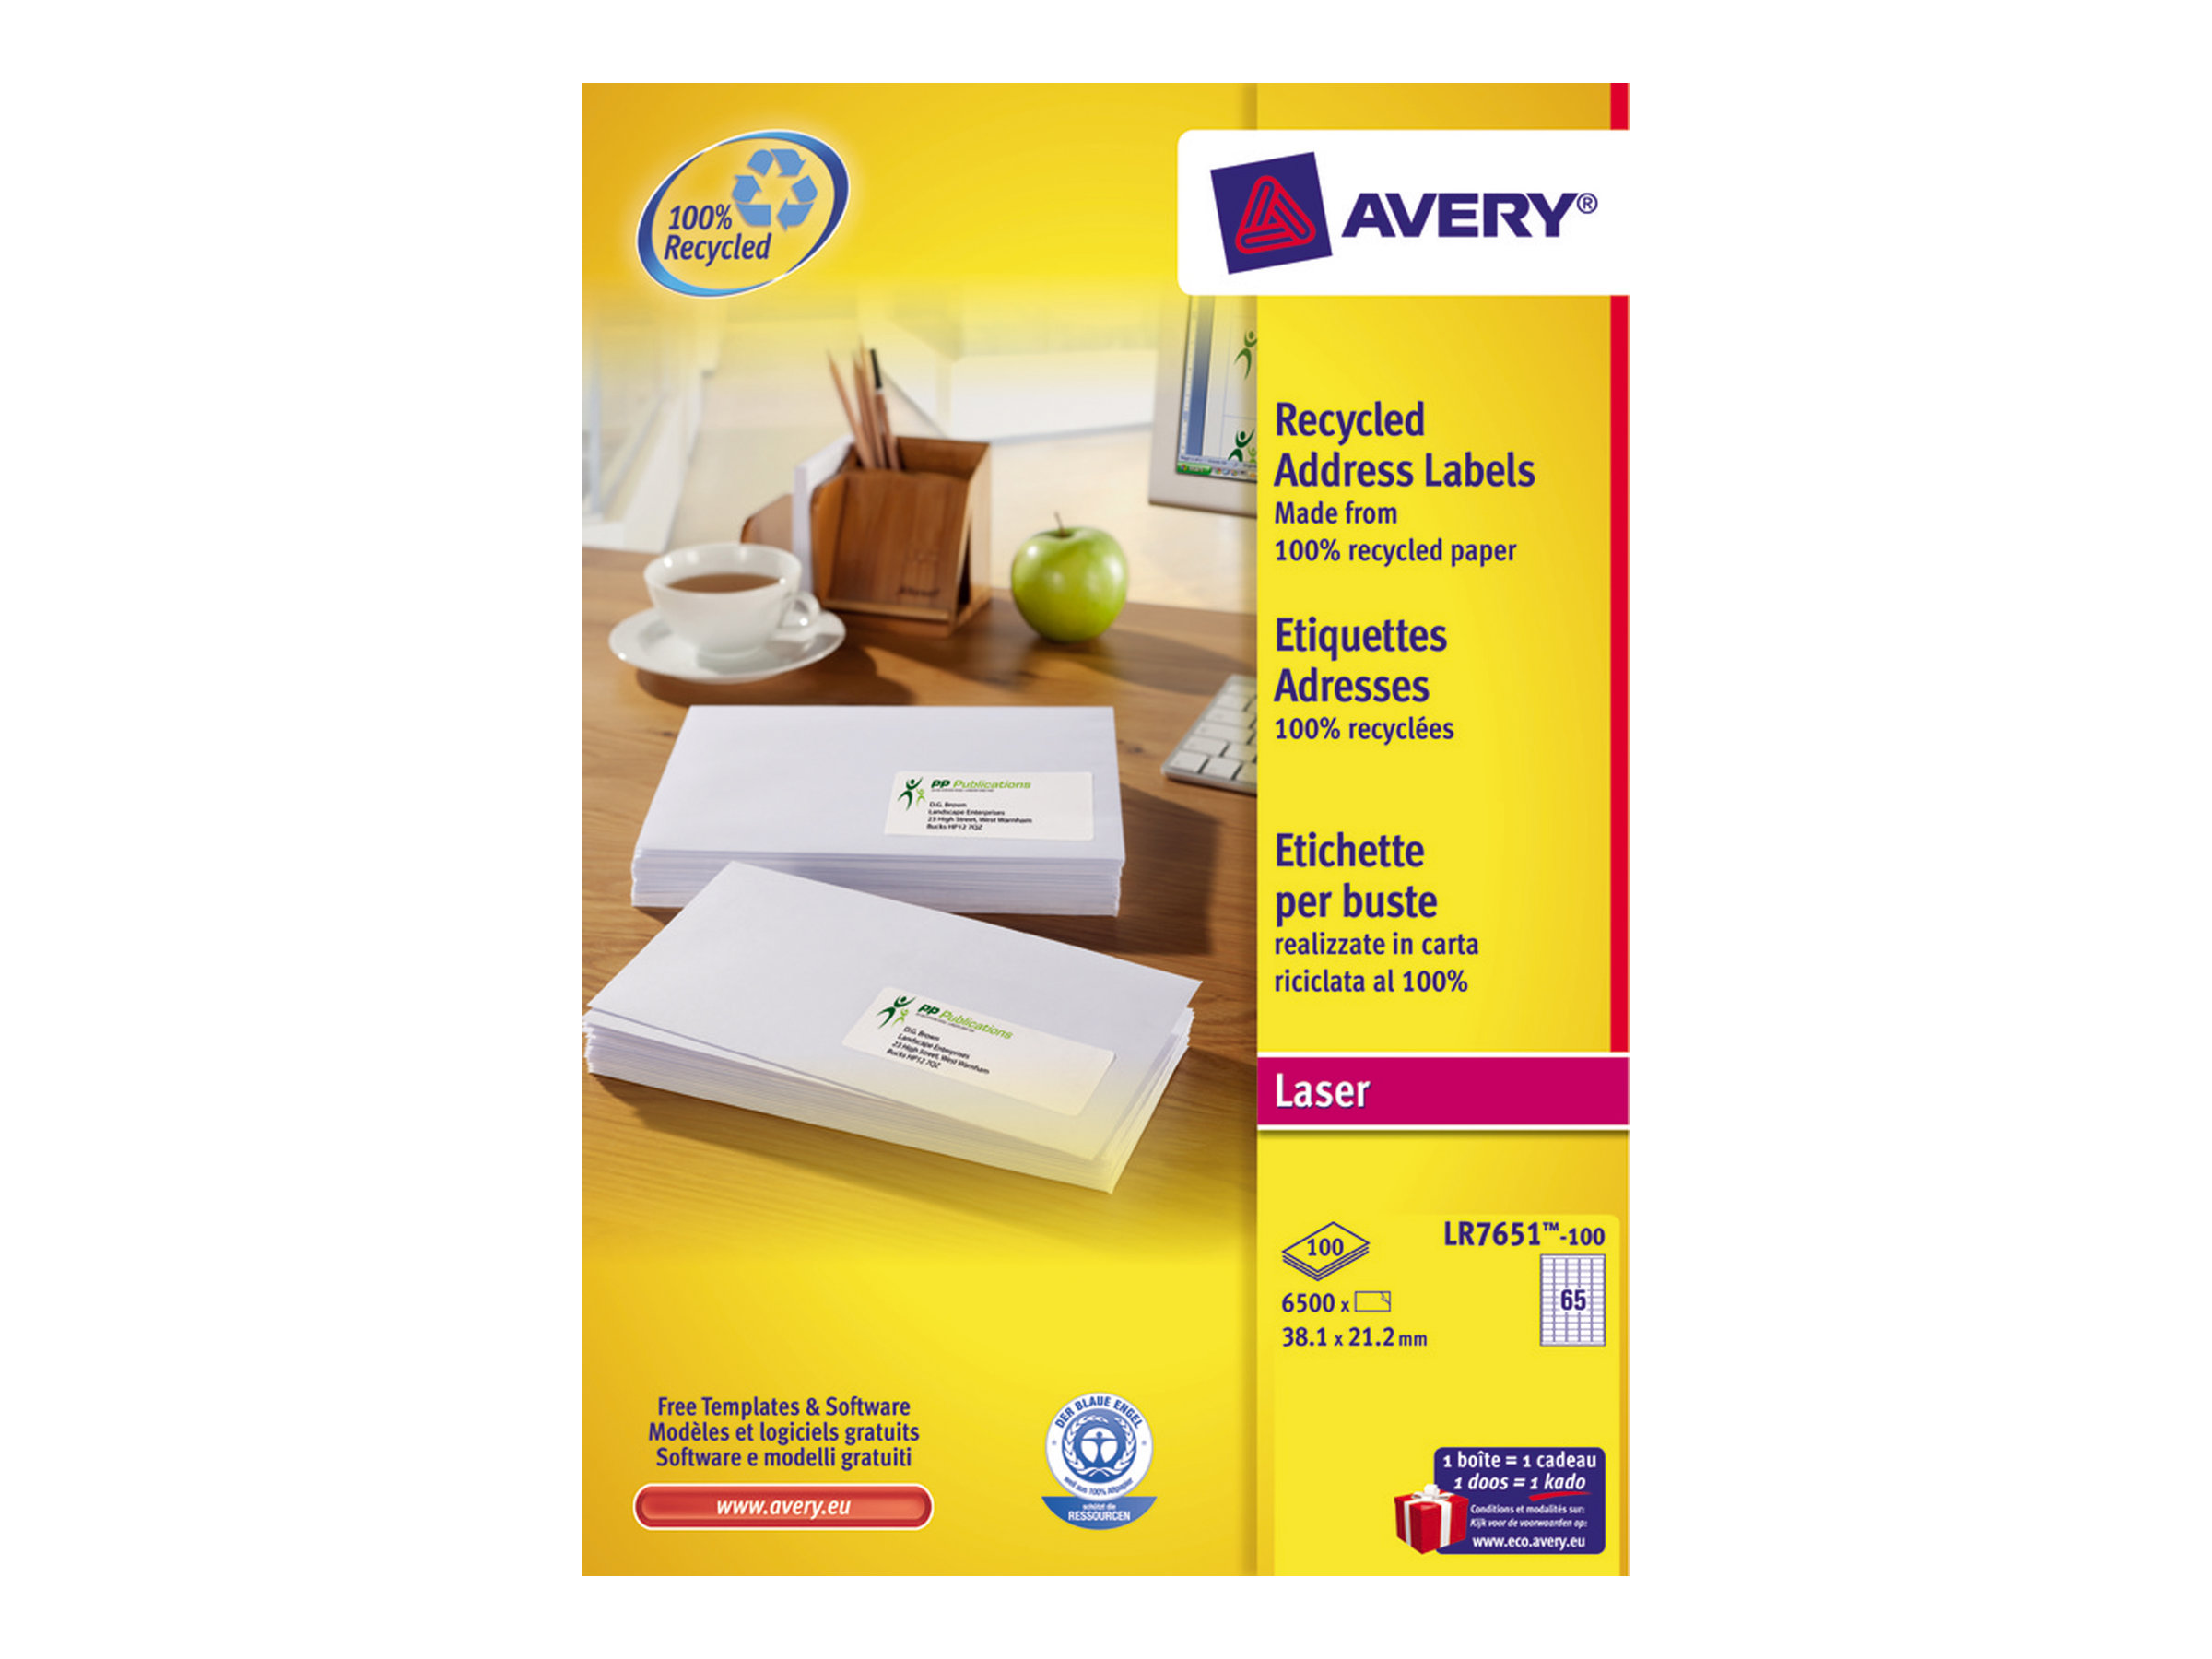 Avery - 6500 Étiquettes adresse recyclées blanches - 38,1 x 21,2 mm - Impression laser - réf LR7651-100